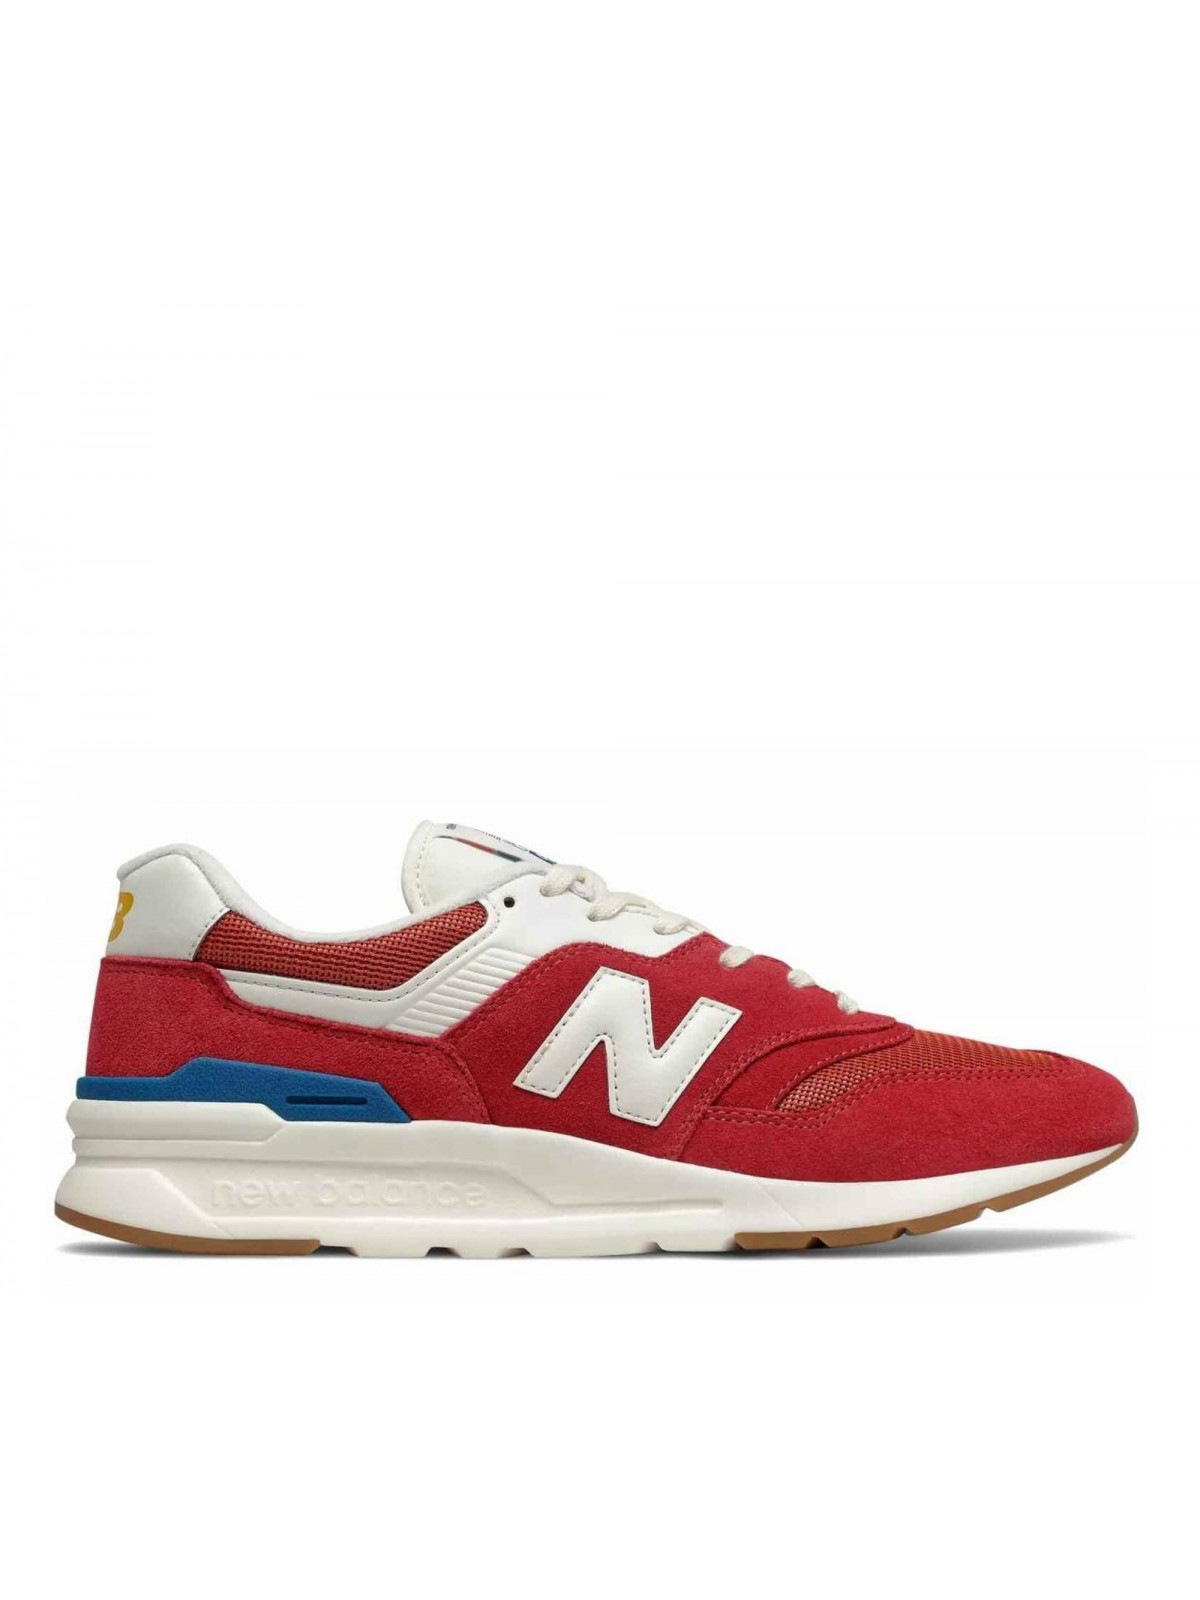 New Balance CM997 rouge